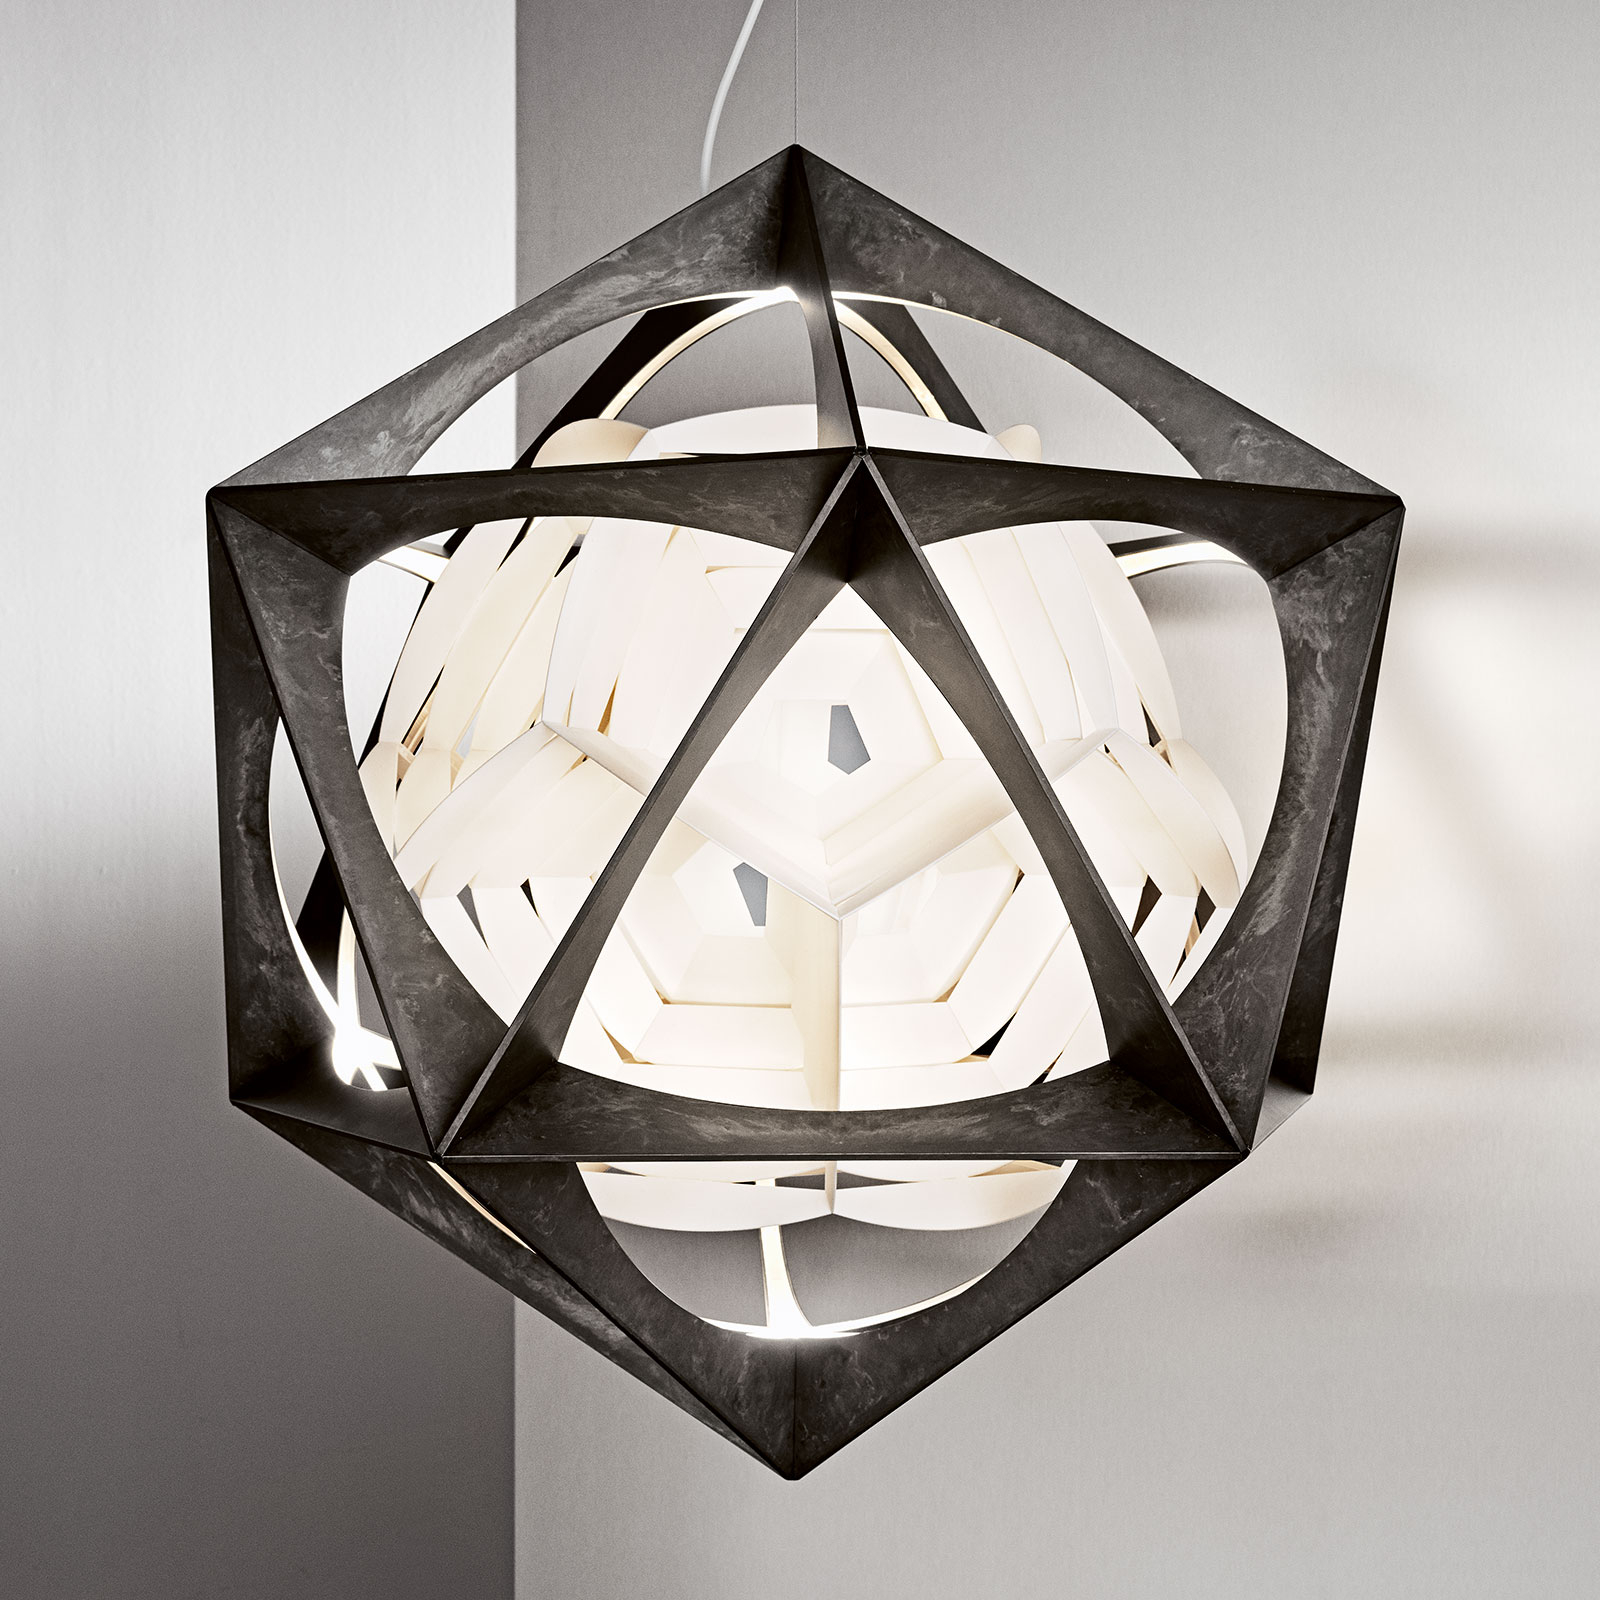 Louis Poulsen LED-Pendelleuchte OE Quasi, 3.000 K